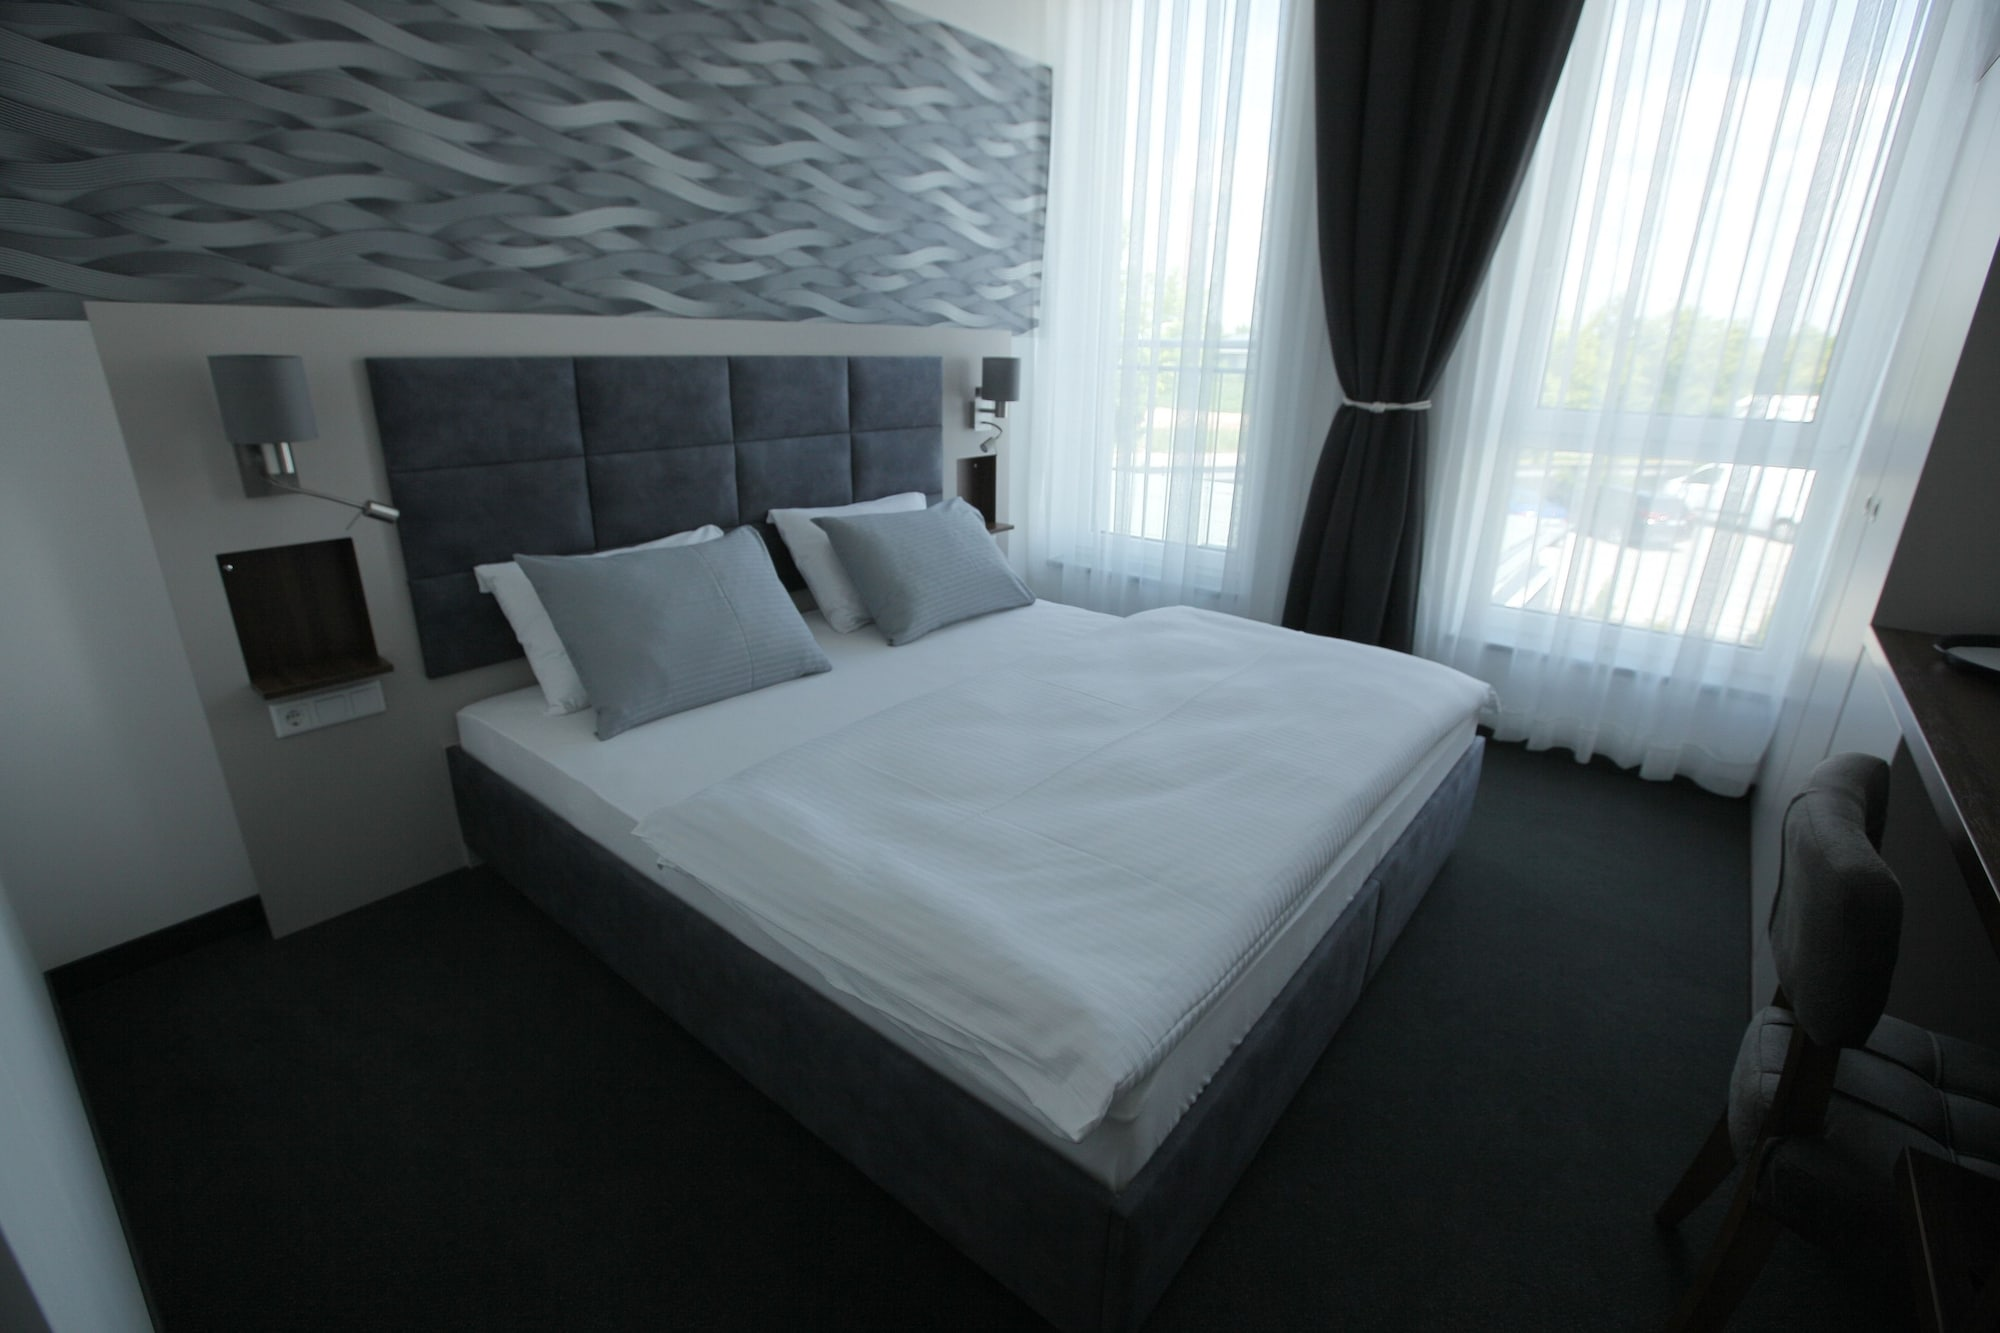 Hotel Starton am Ingolstadt Outlet, Ingolstadt